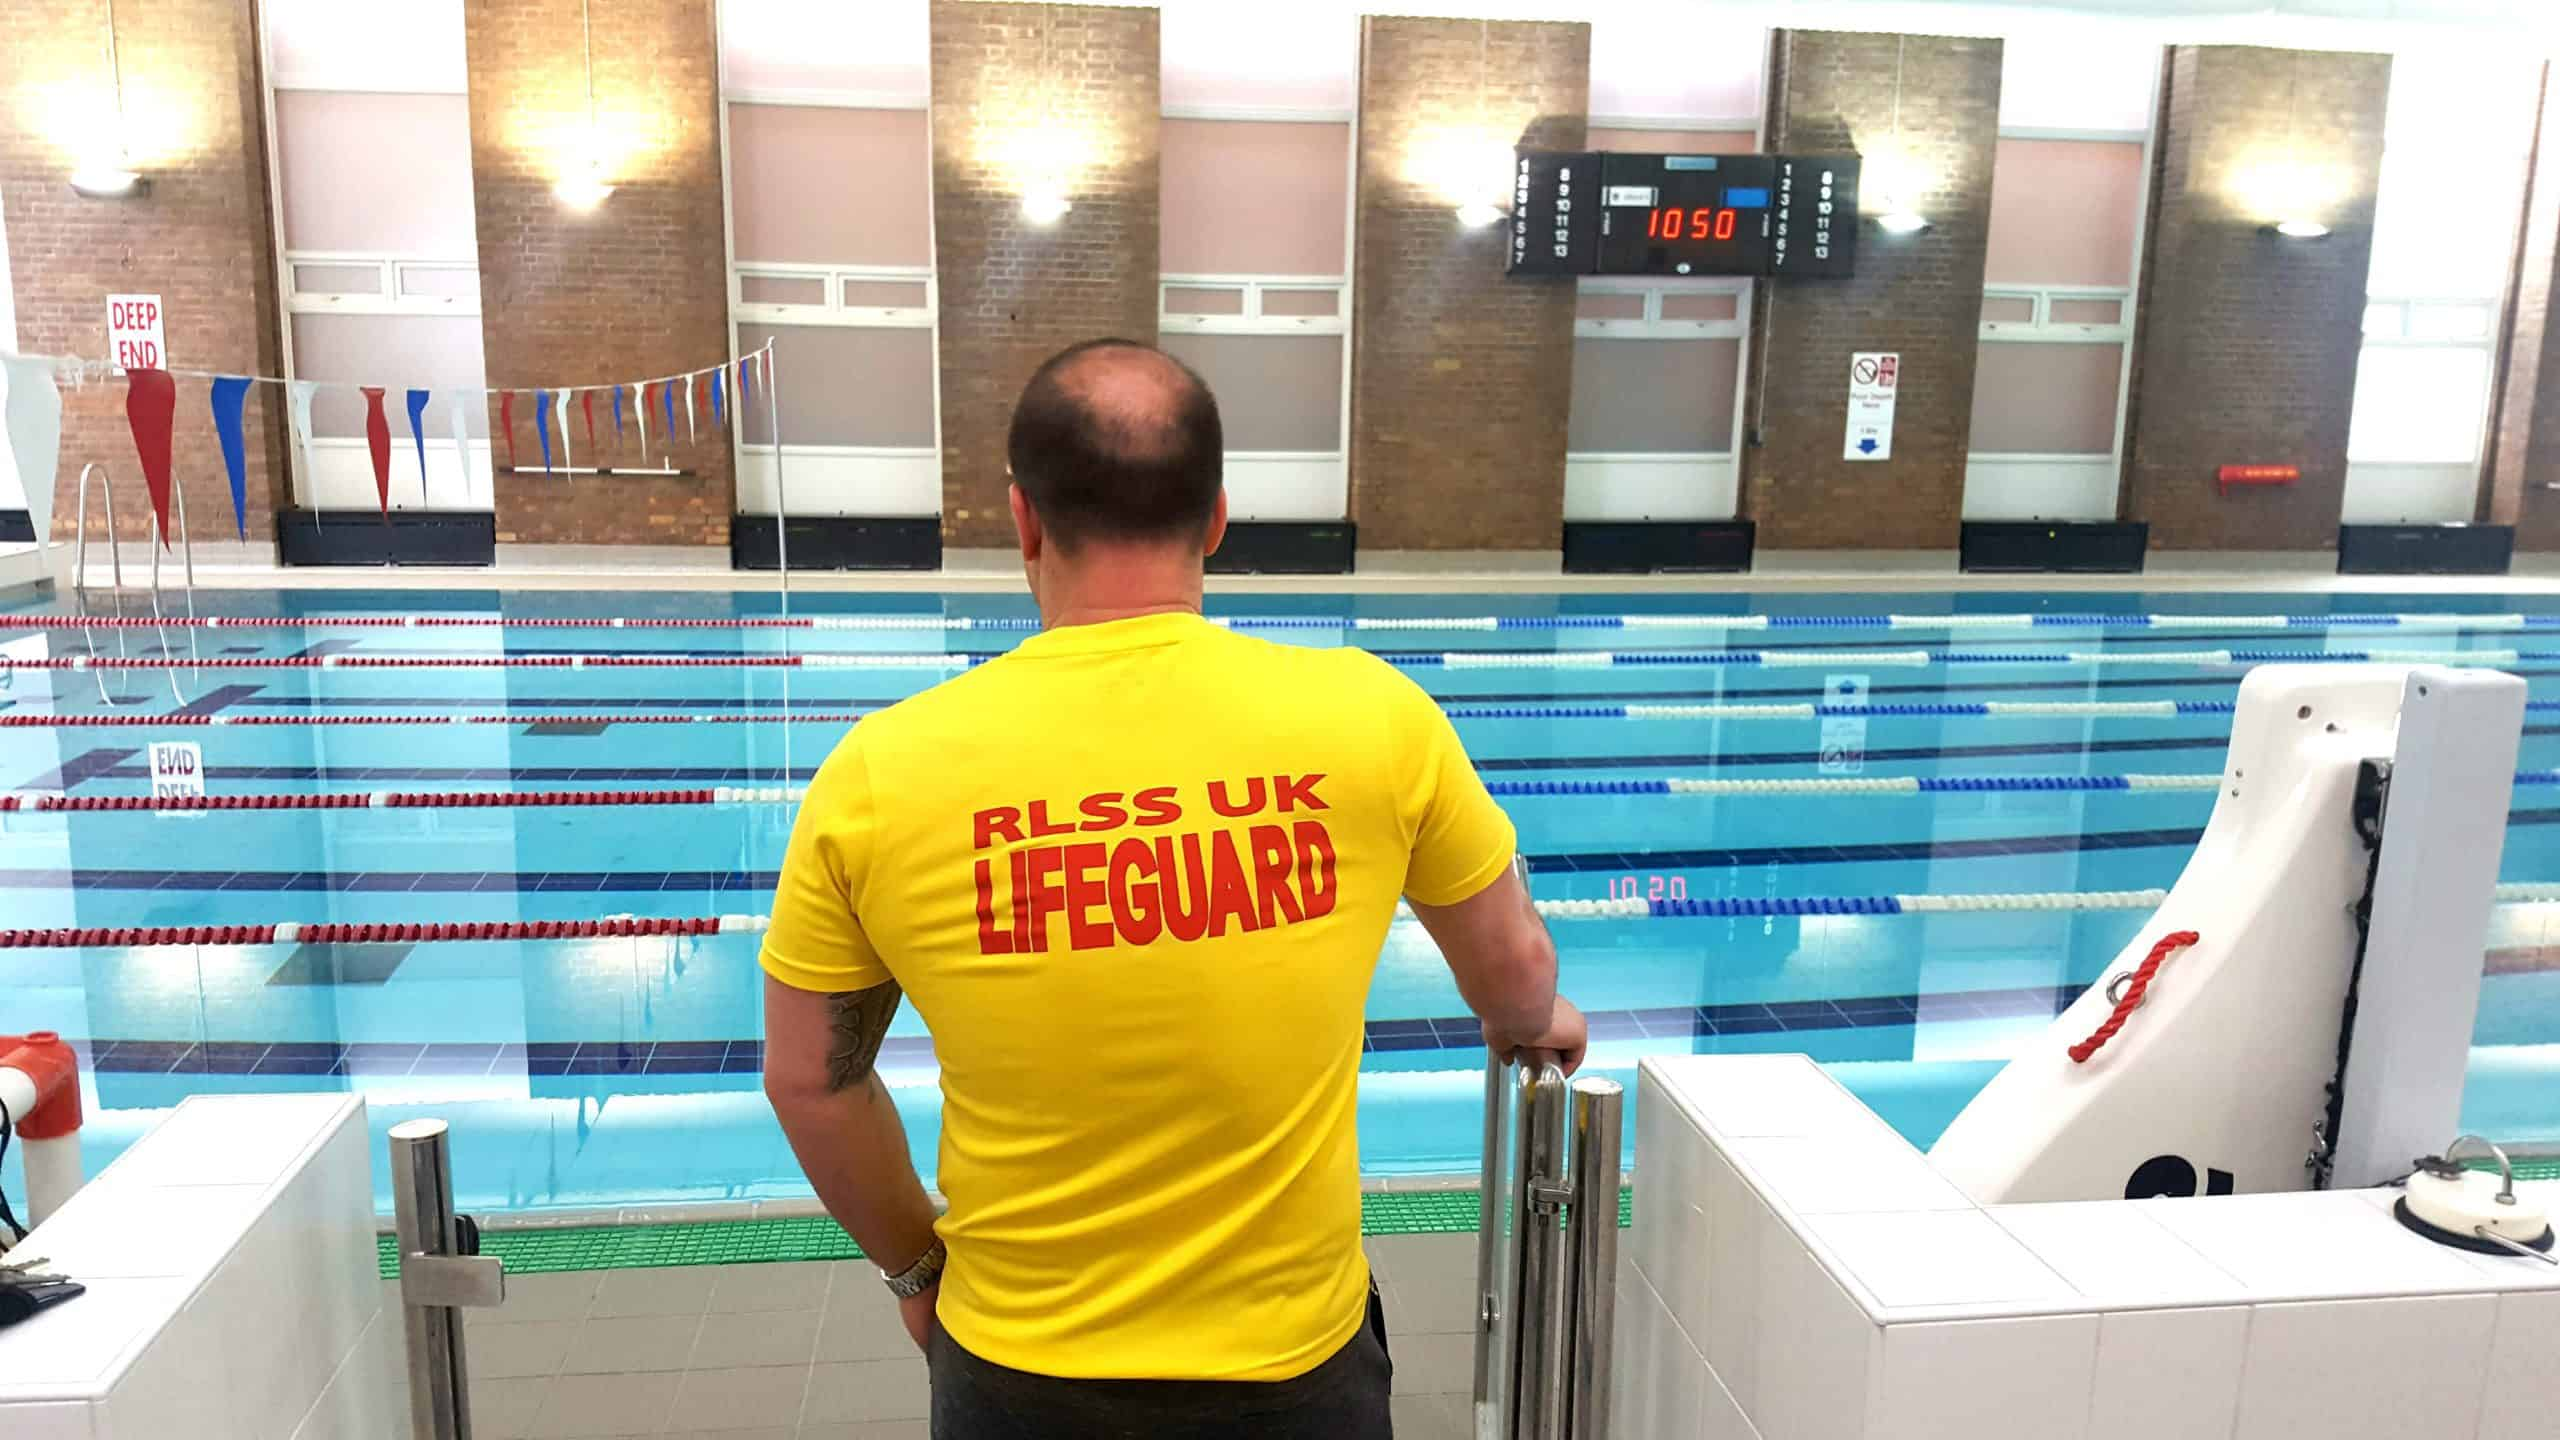 Nation Pool Lifeguard Qualification (NPLQ)